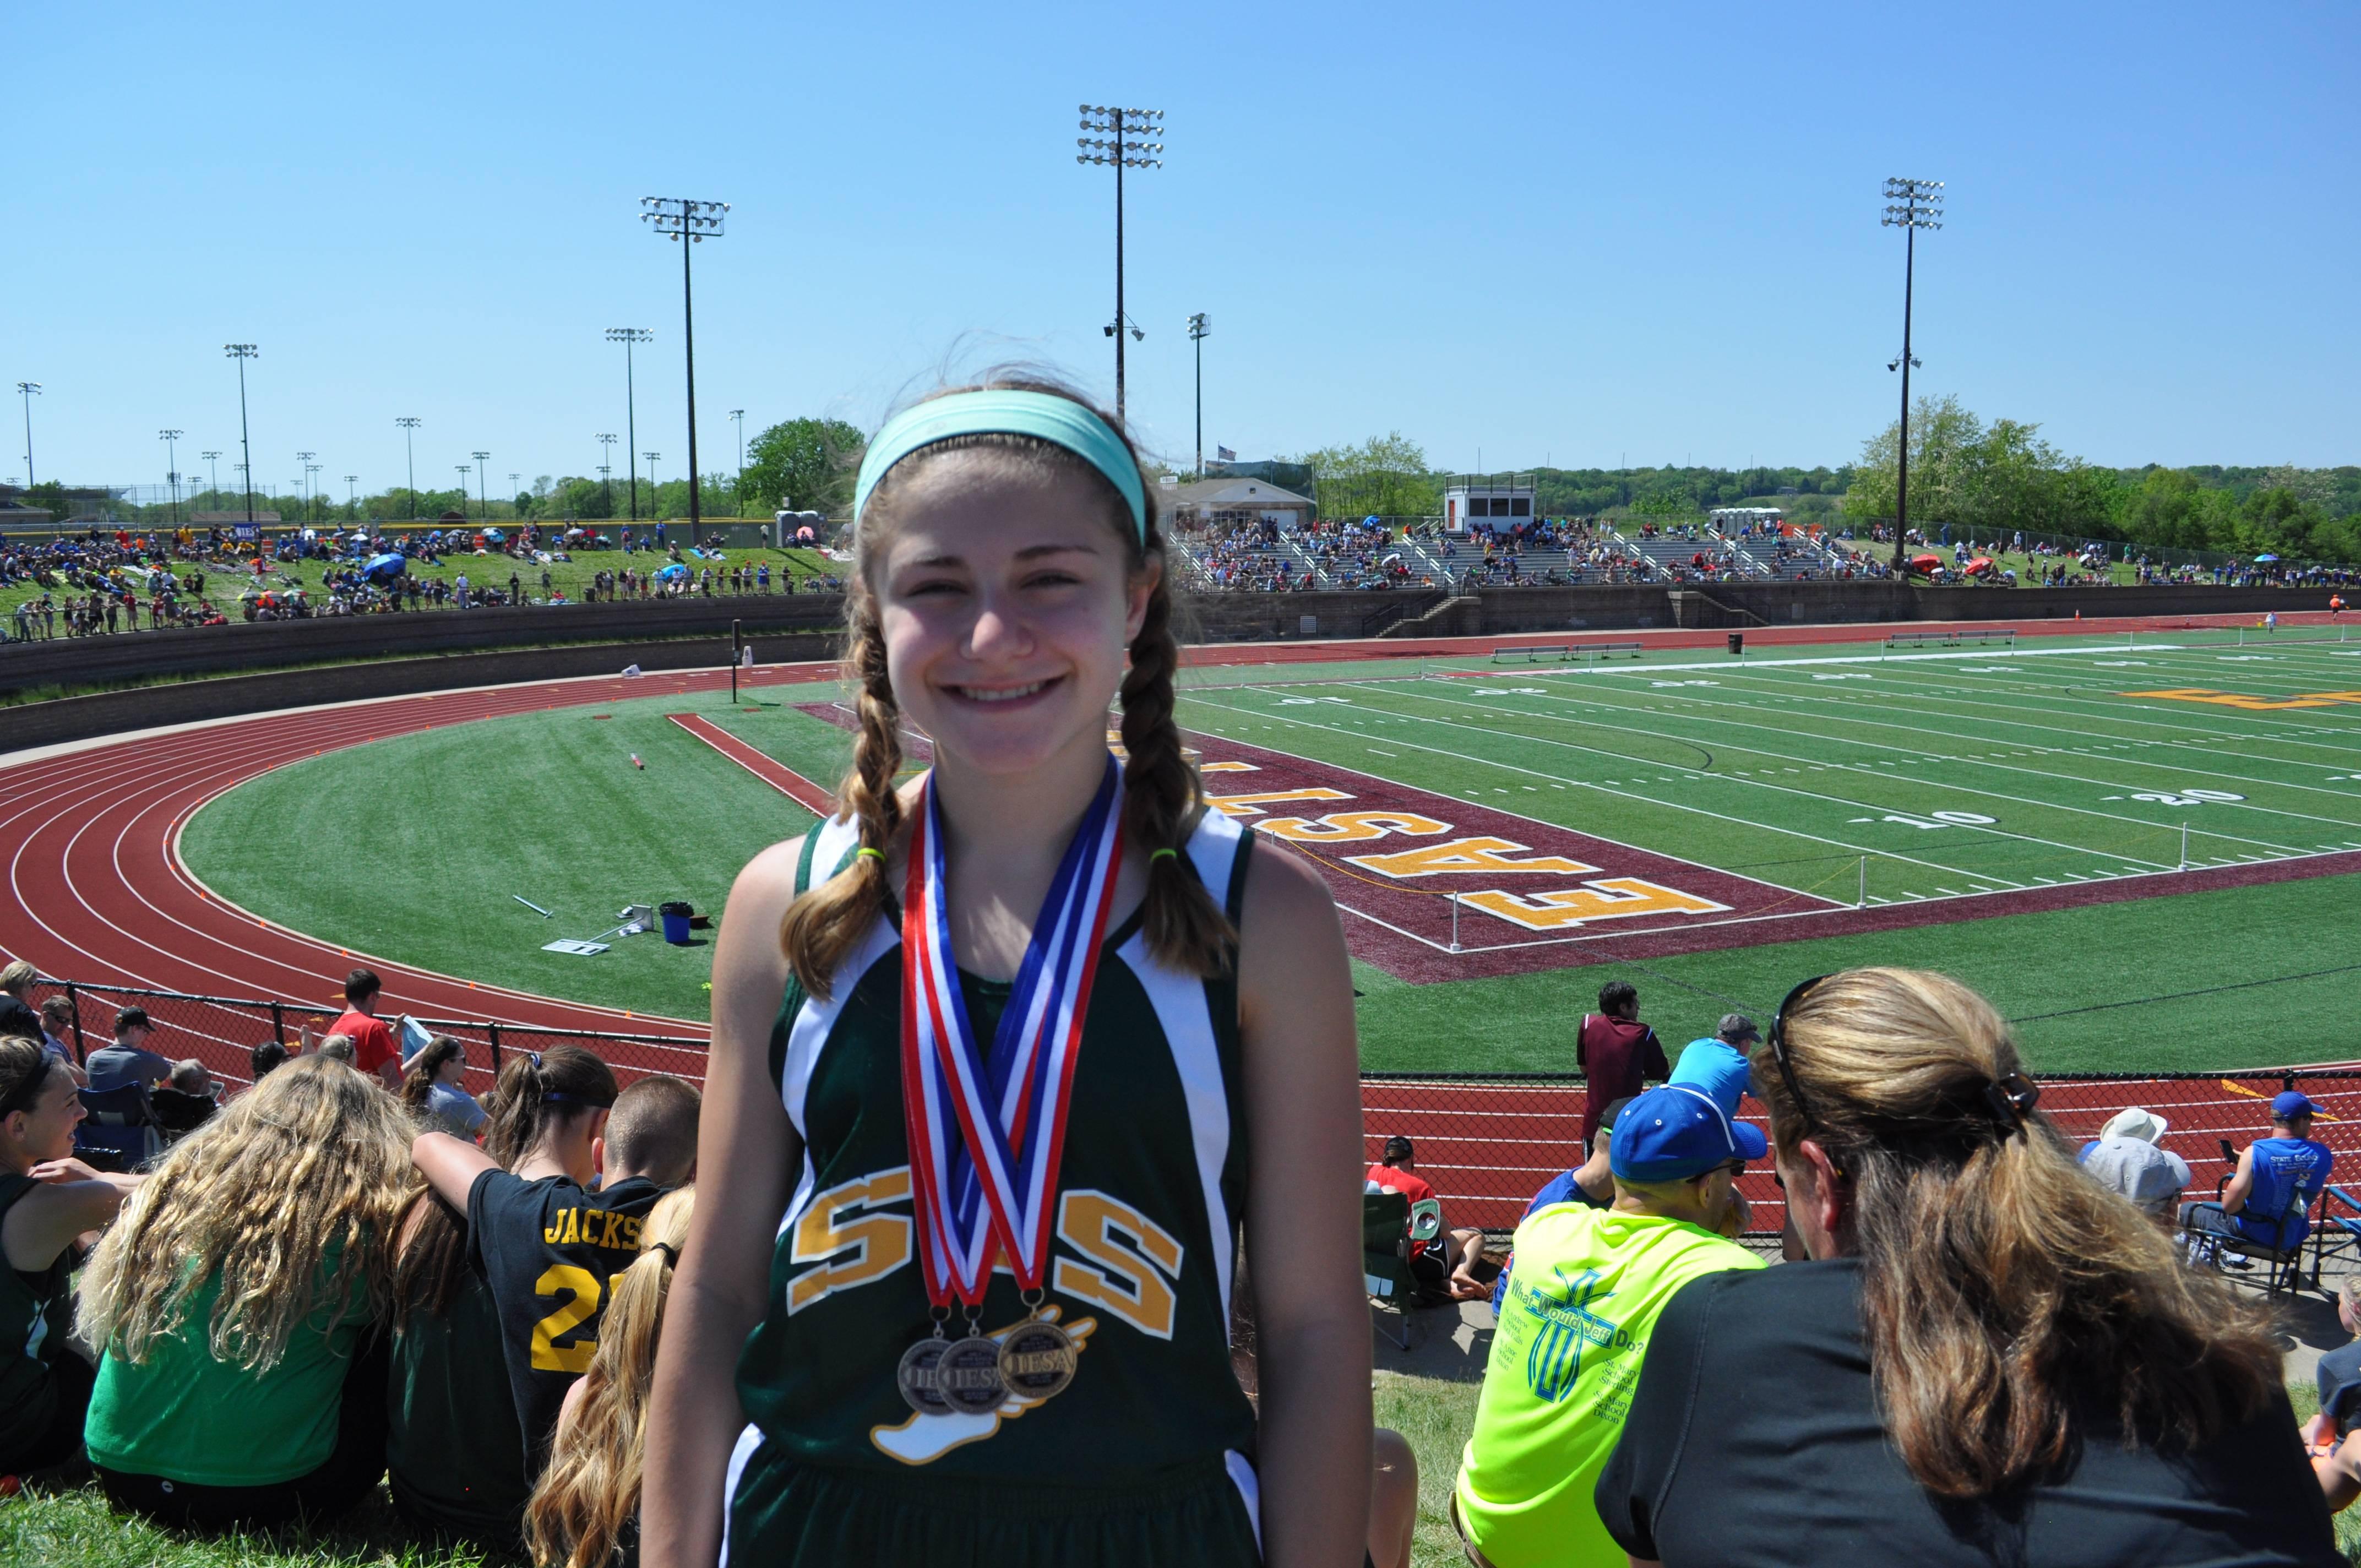 St. Theresa School Track & Field Team Achieves Amazing Accomplishments